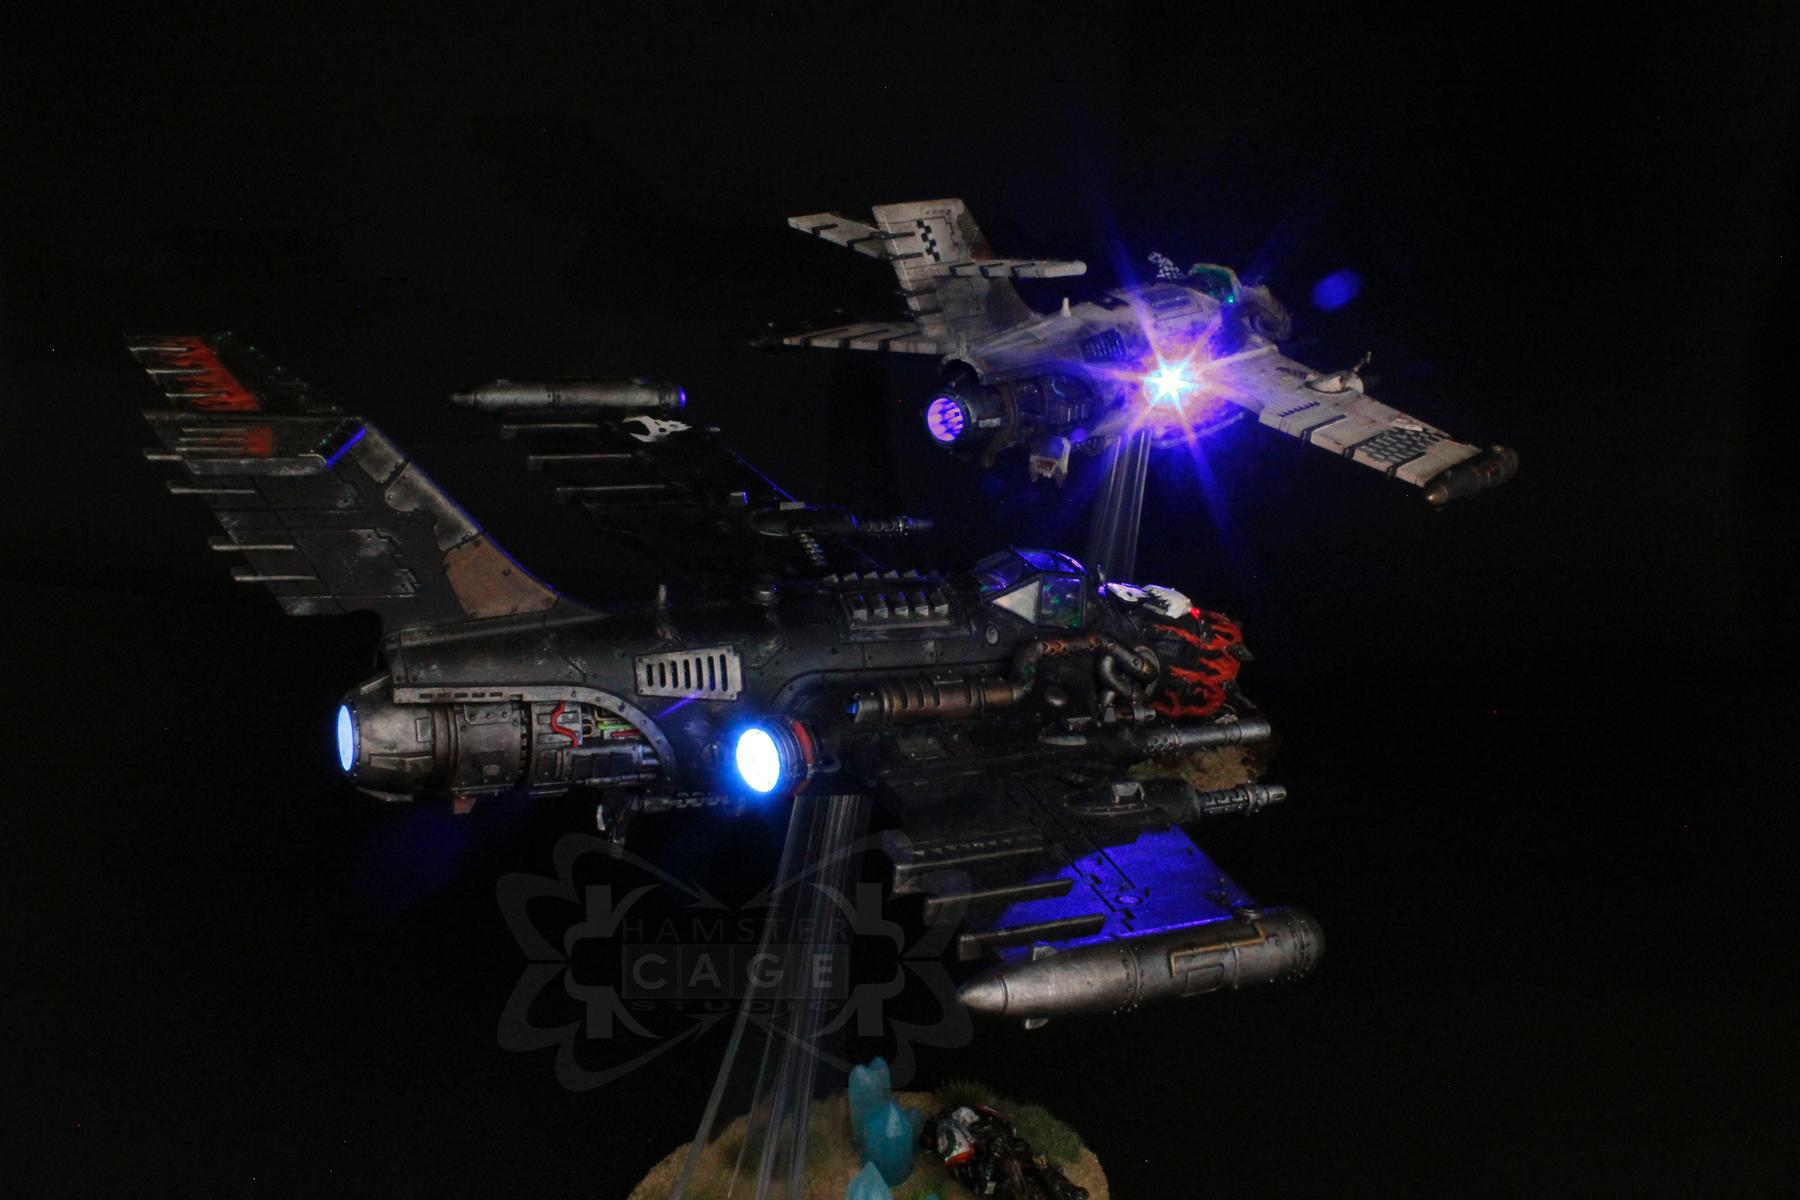 Aircraft, Dakka Jet, Dakkajet, Fighta-bomba, Orcs, Ork Aircraft, Ork Plane, Orks, Plane